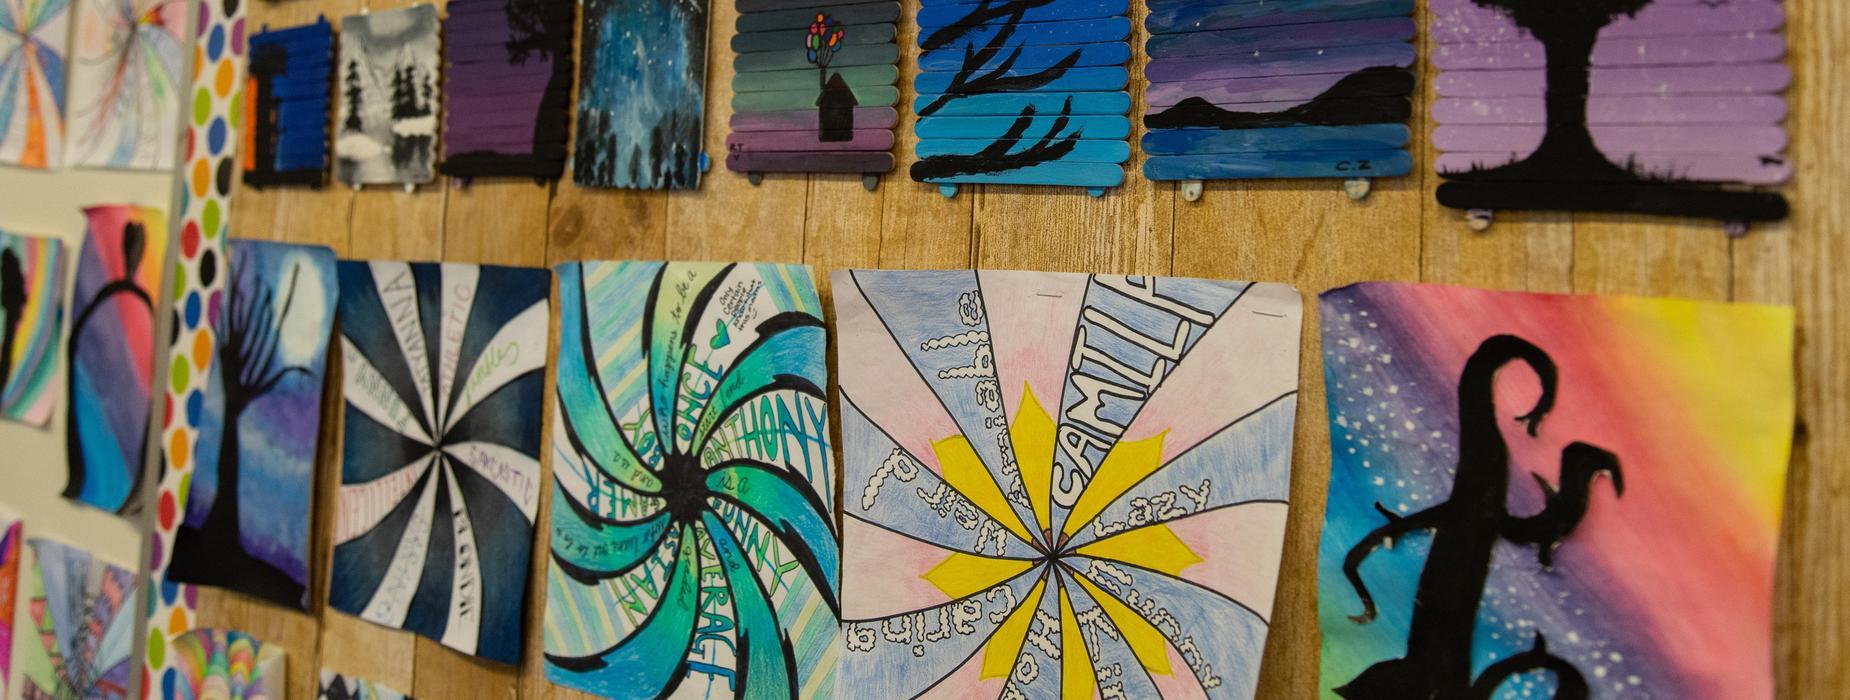 Marguerita school art work